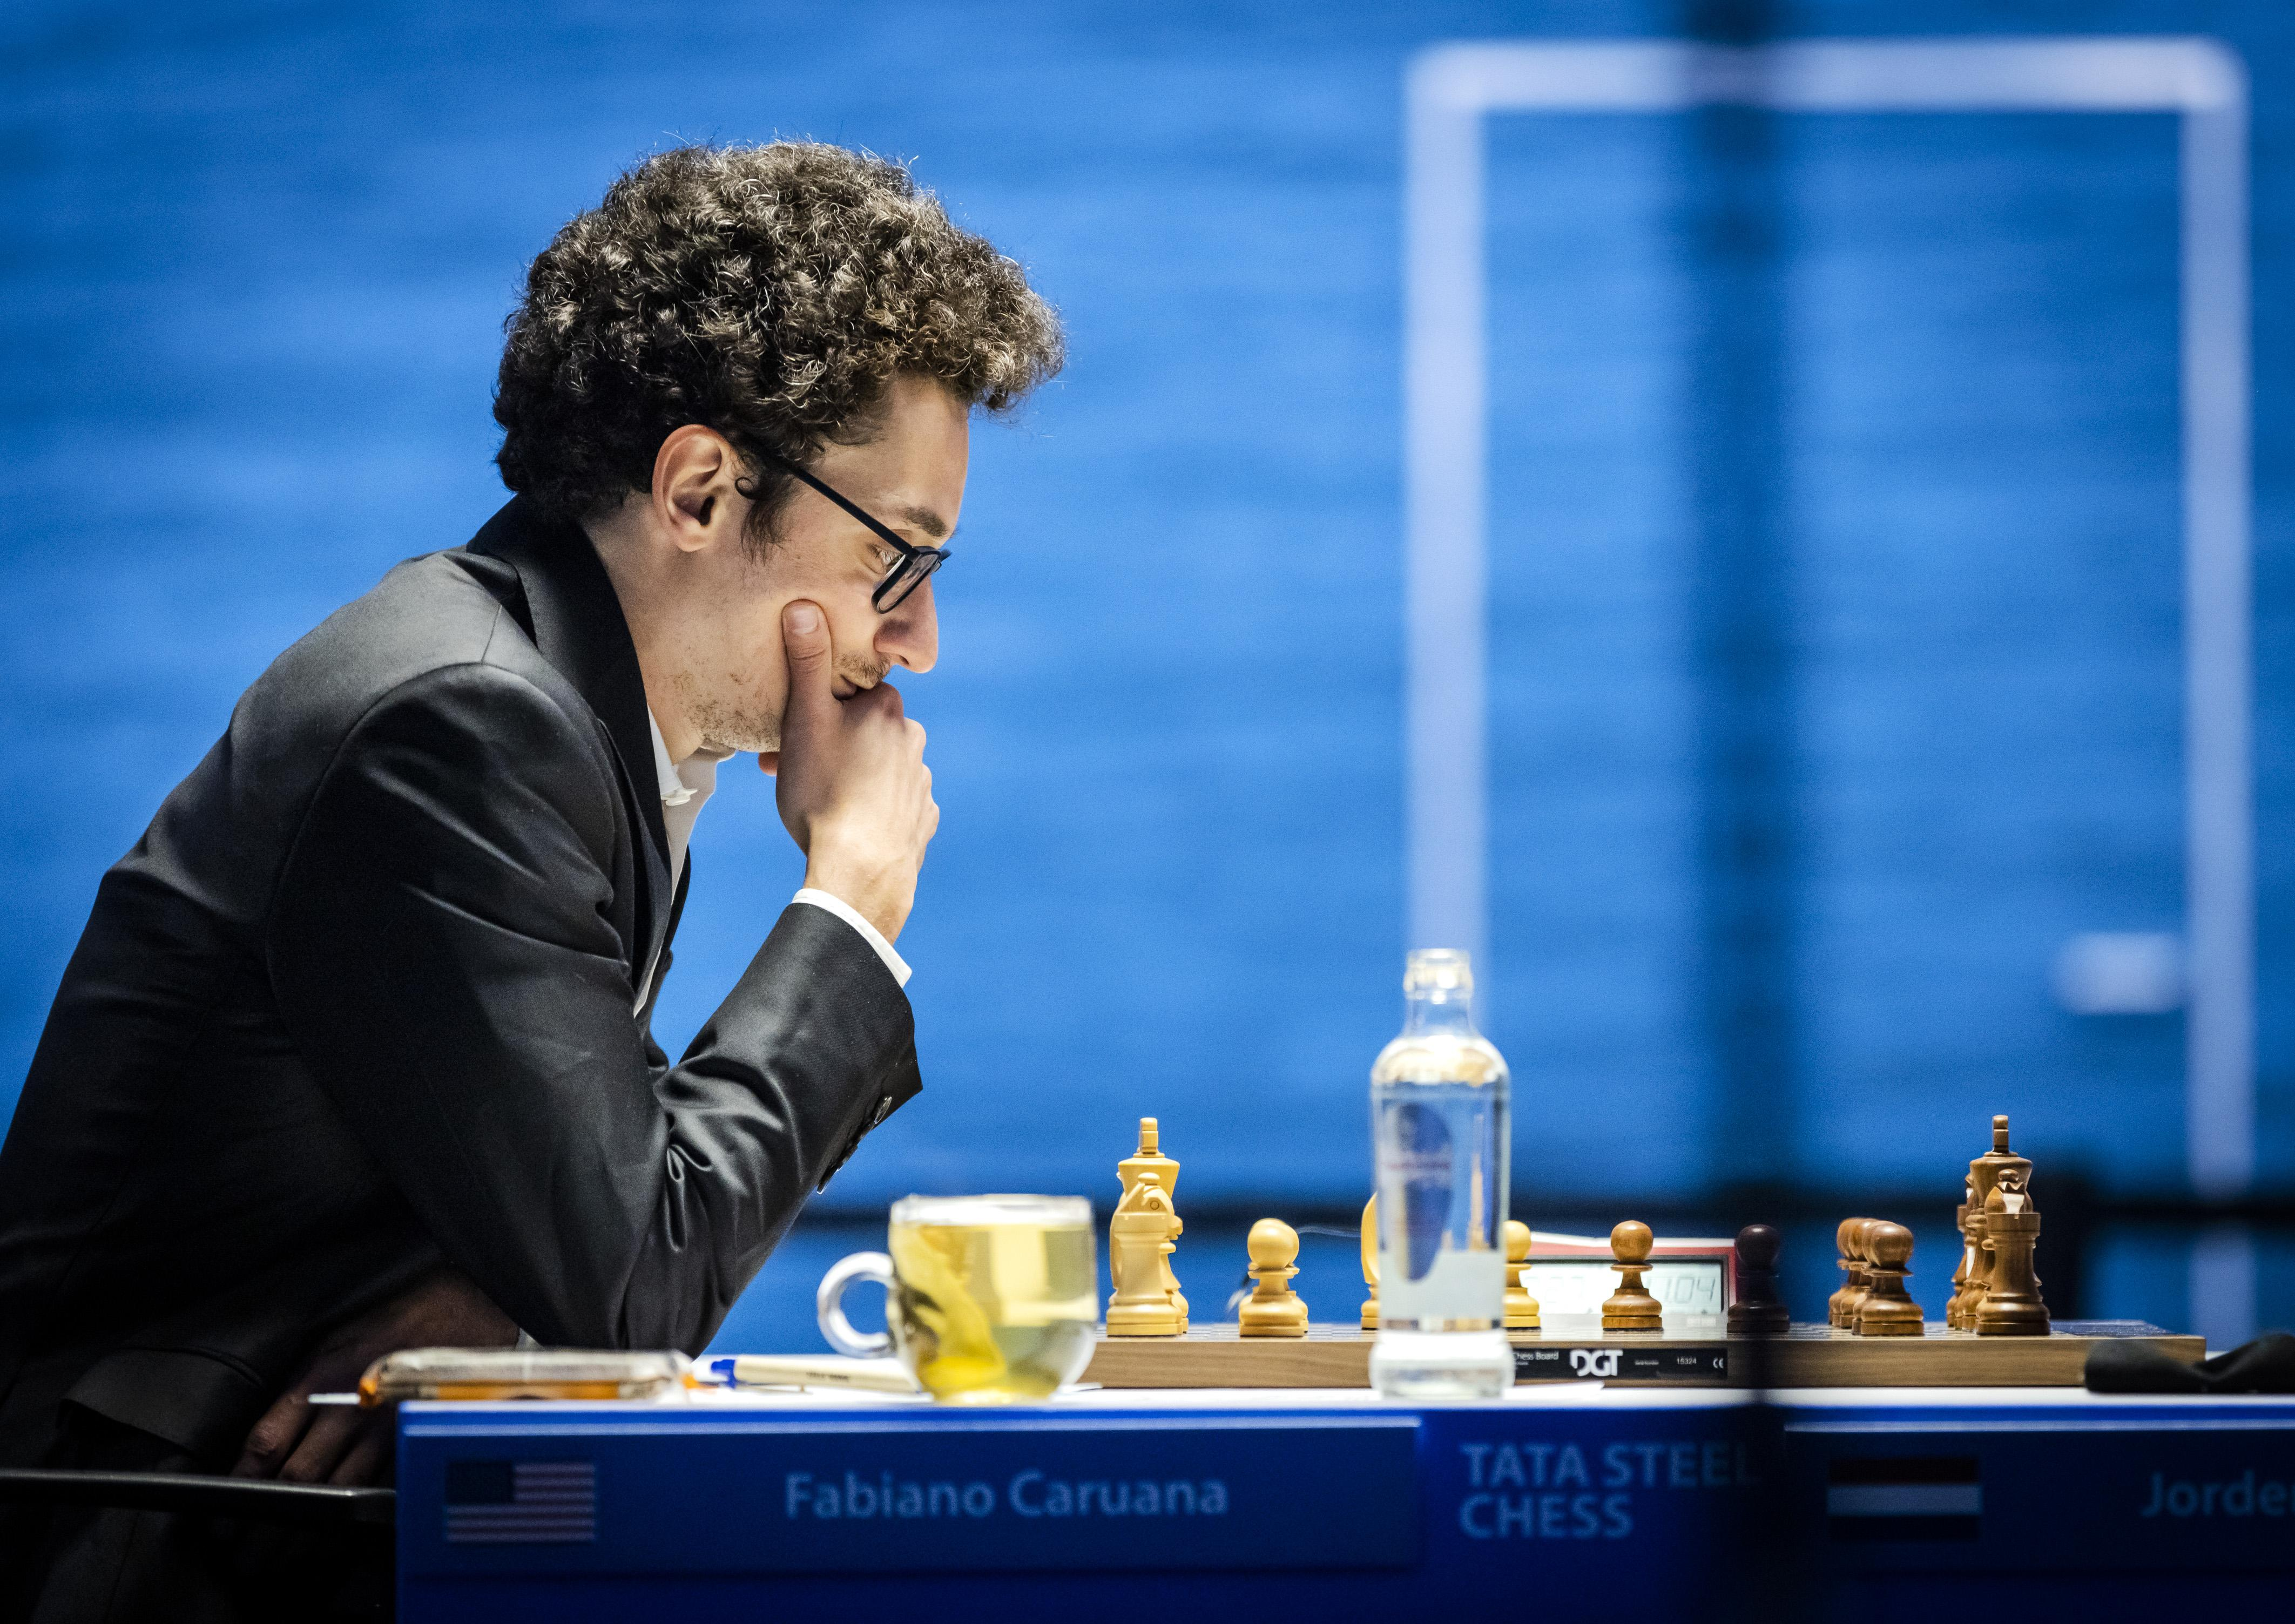 Wat viel Dimitri Reinderman in speelronde 2 van Tata Steel Chess op? Fabiano Caruana wint op briljante wijze